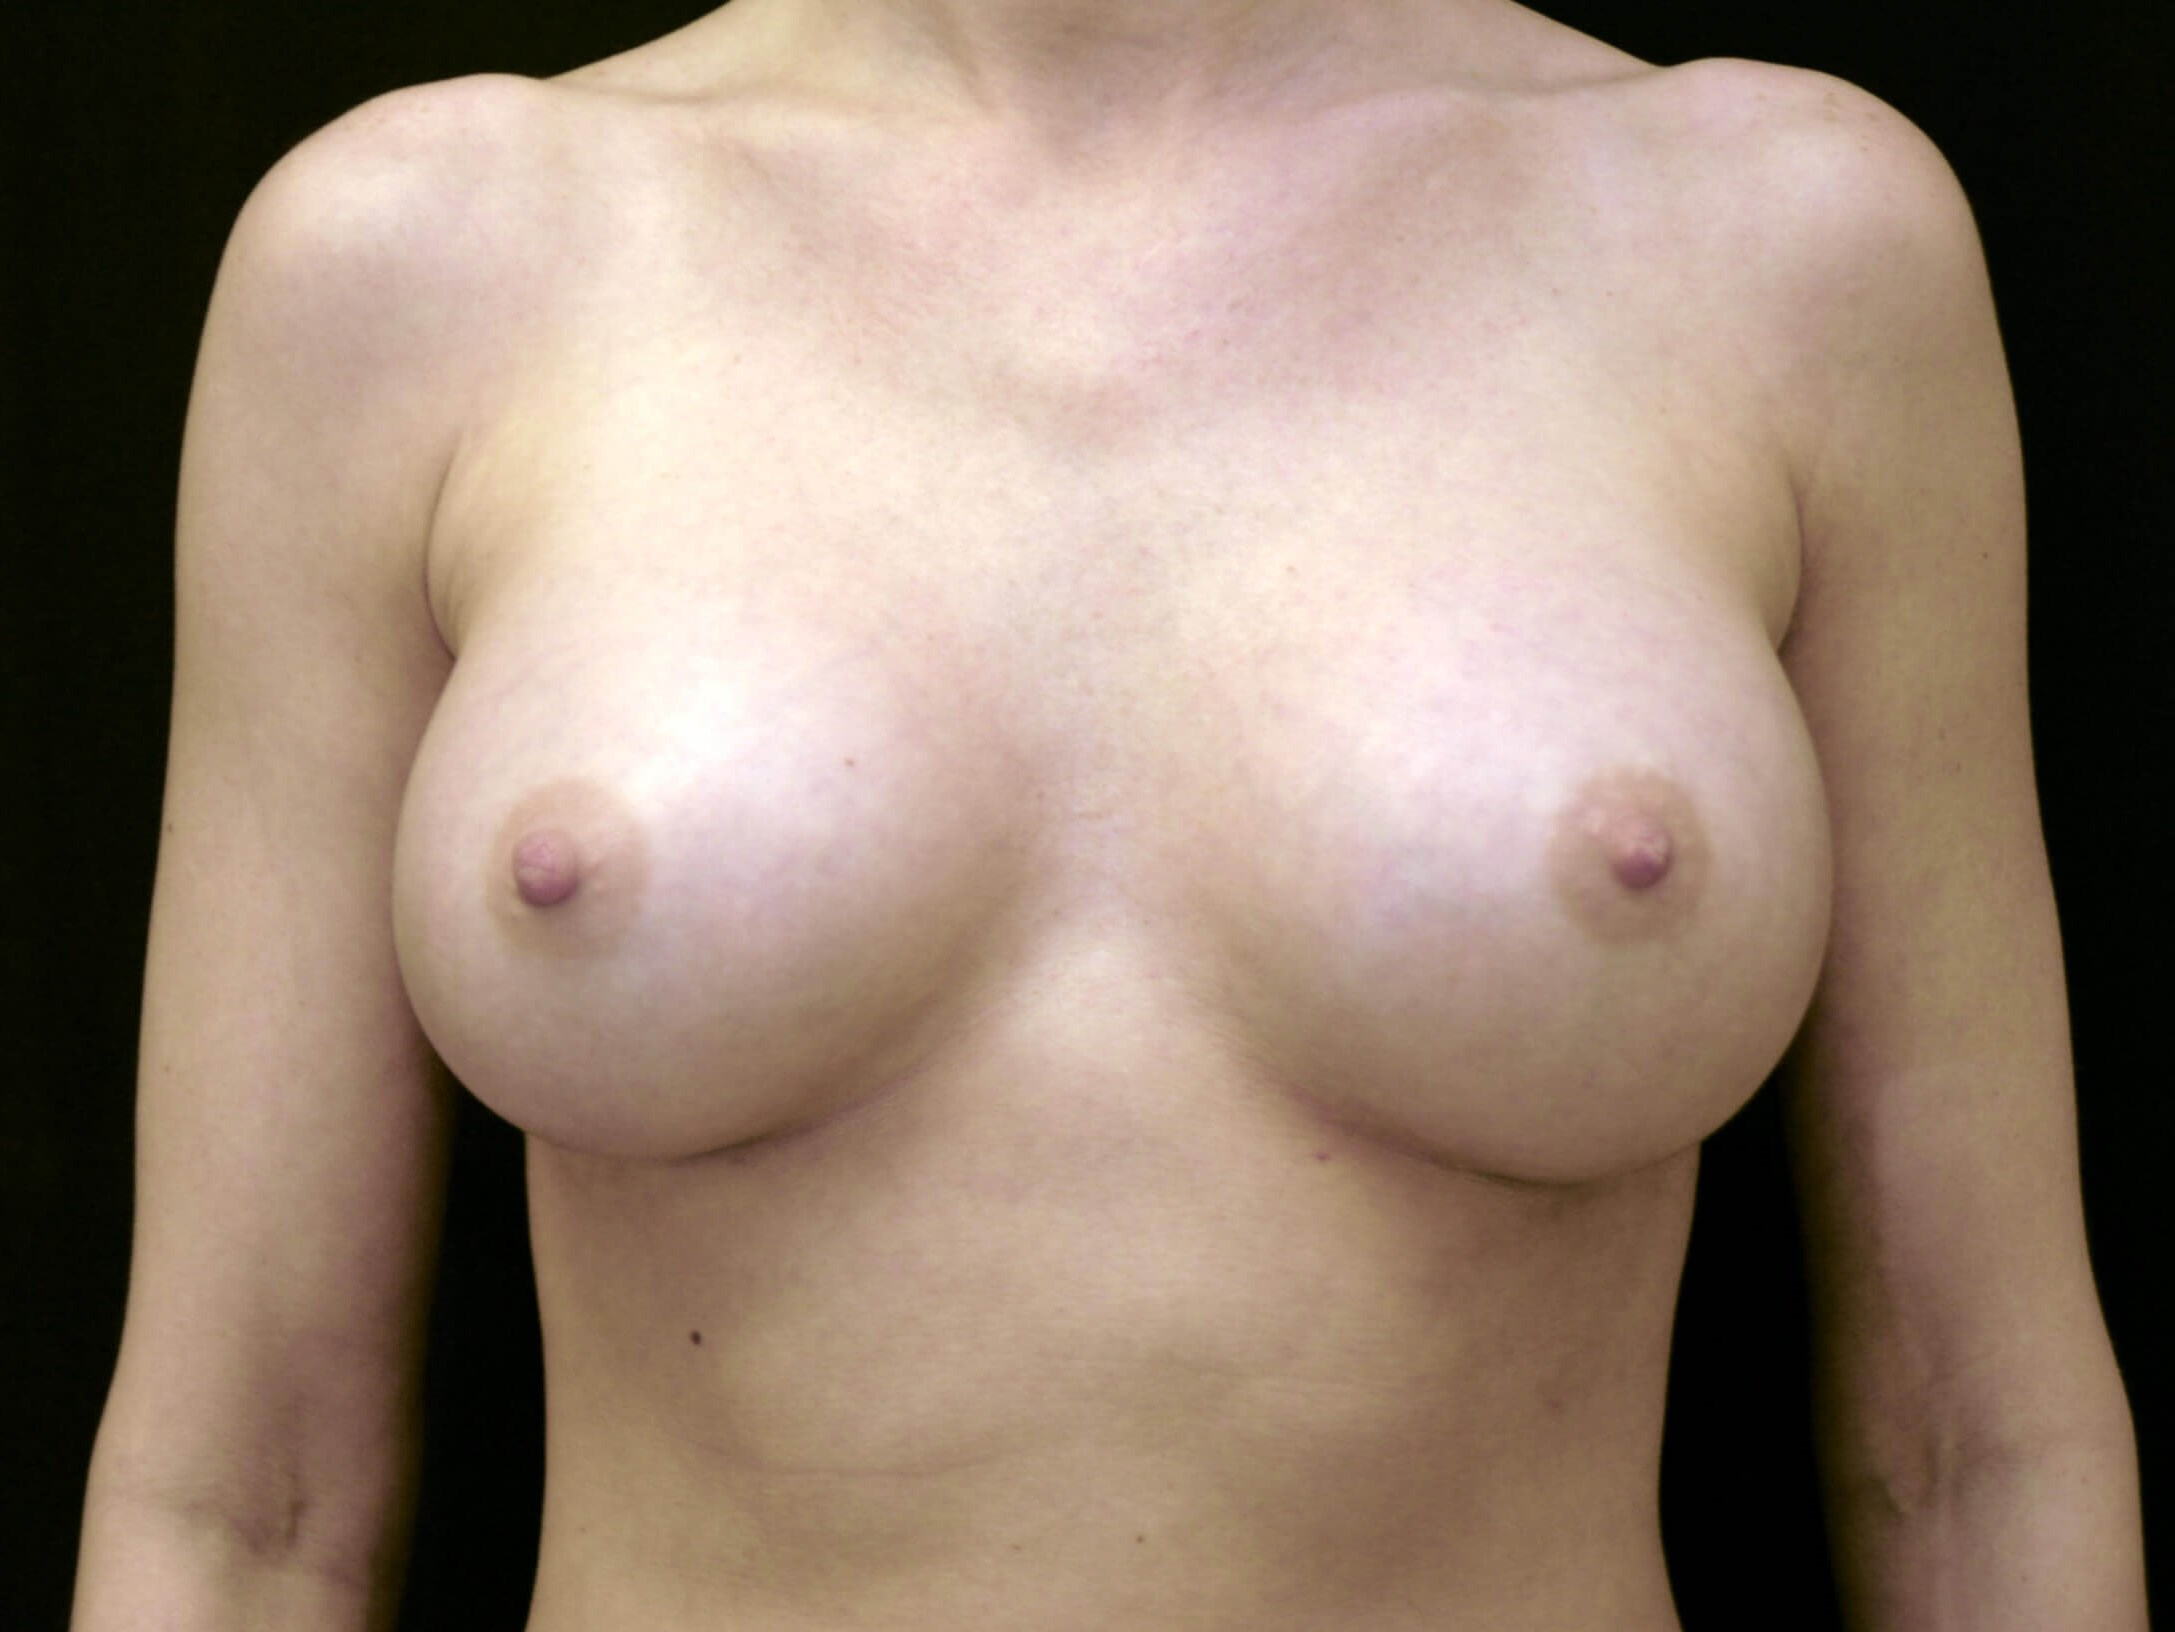 DALLAS, TEXAS WOMAN HAS BREAST AUGMENTATION WITH SILICONE GEL IMPLANTS